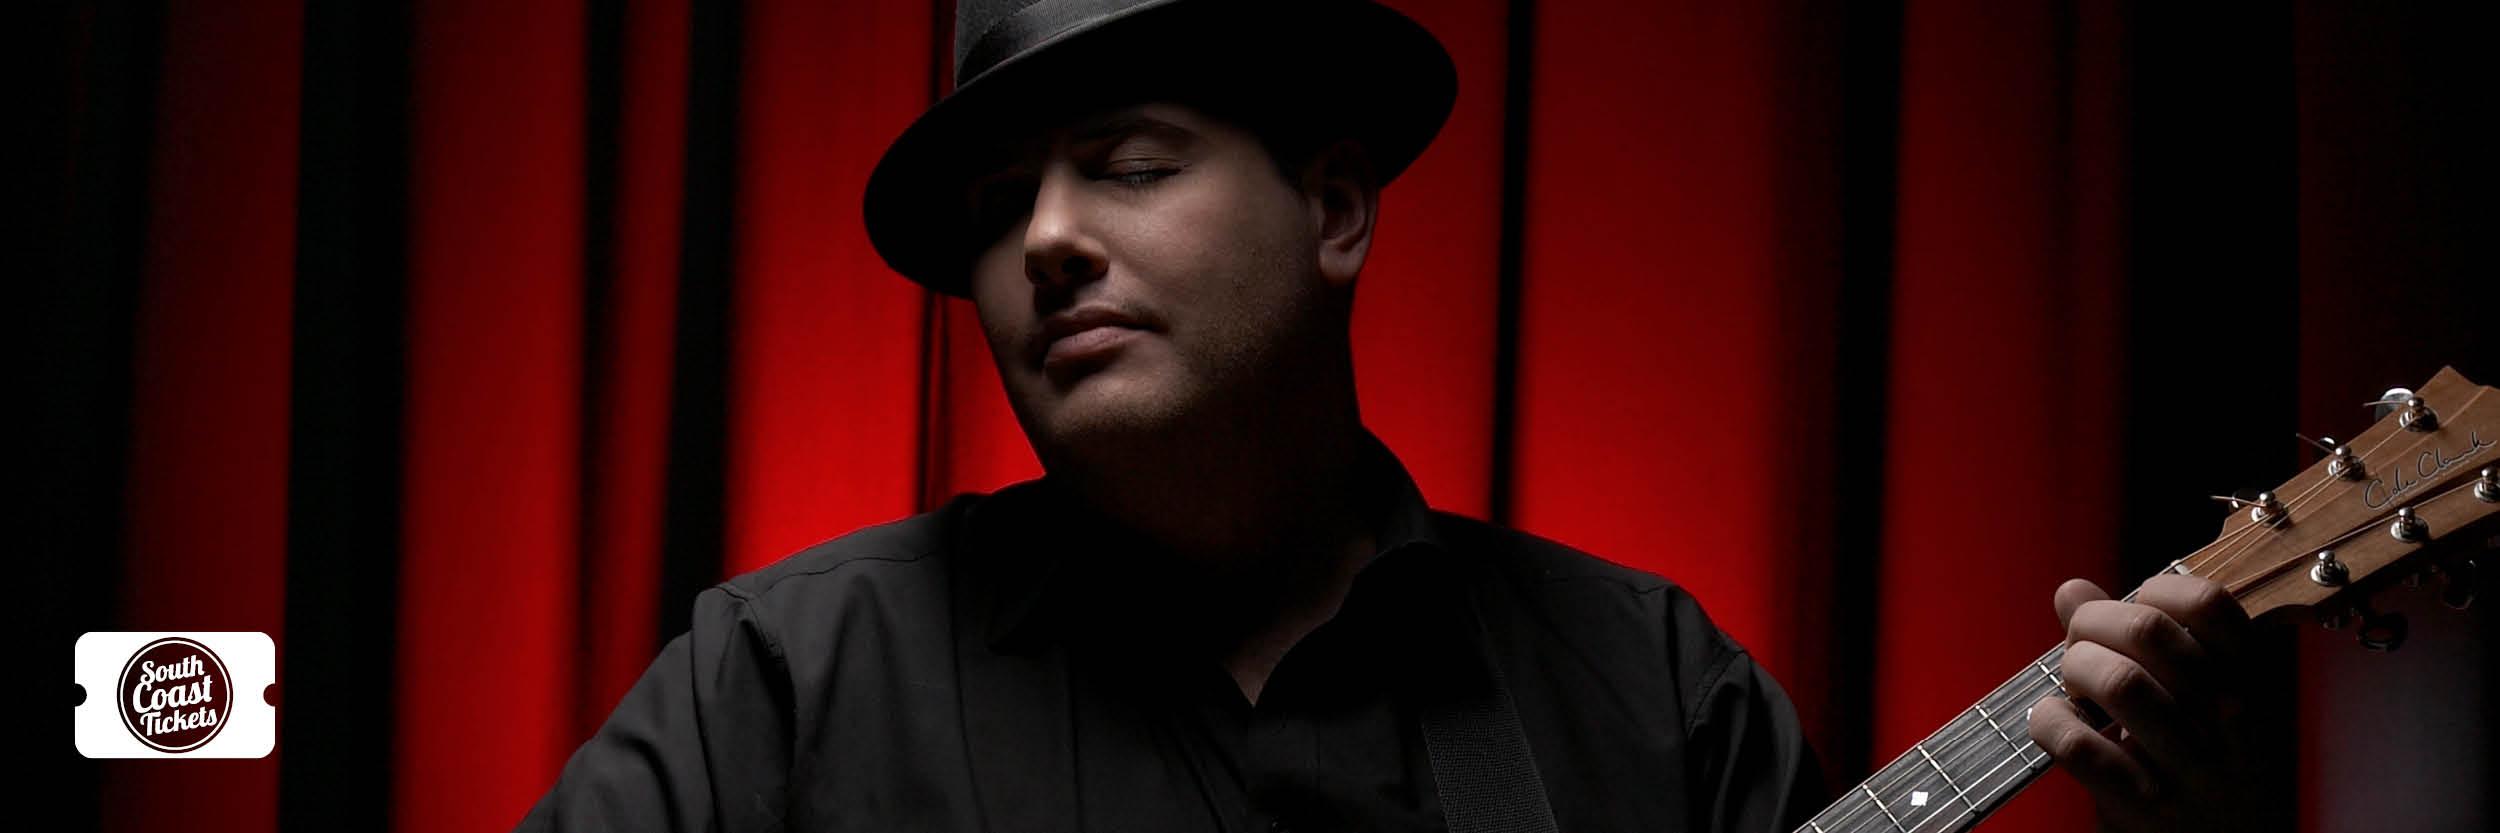 Sounds Delicious Presents...Lloyd Spiegel New Album and East Coast Tour